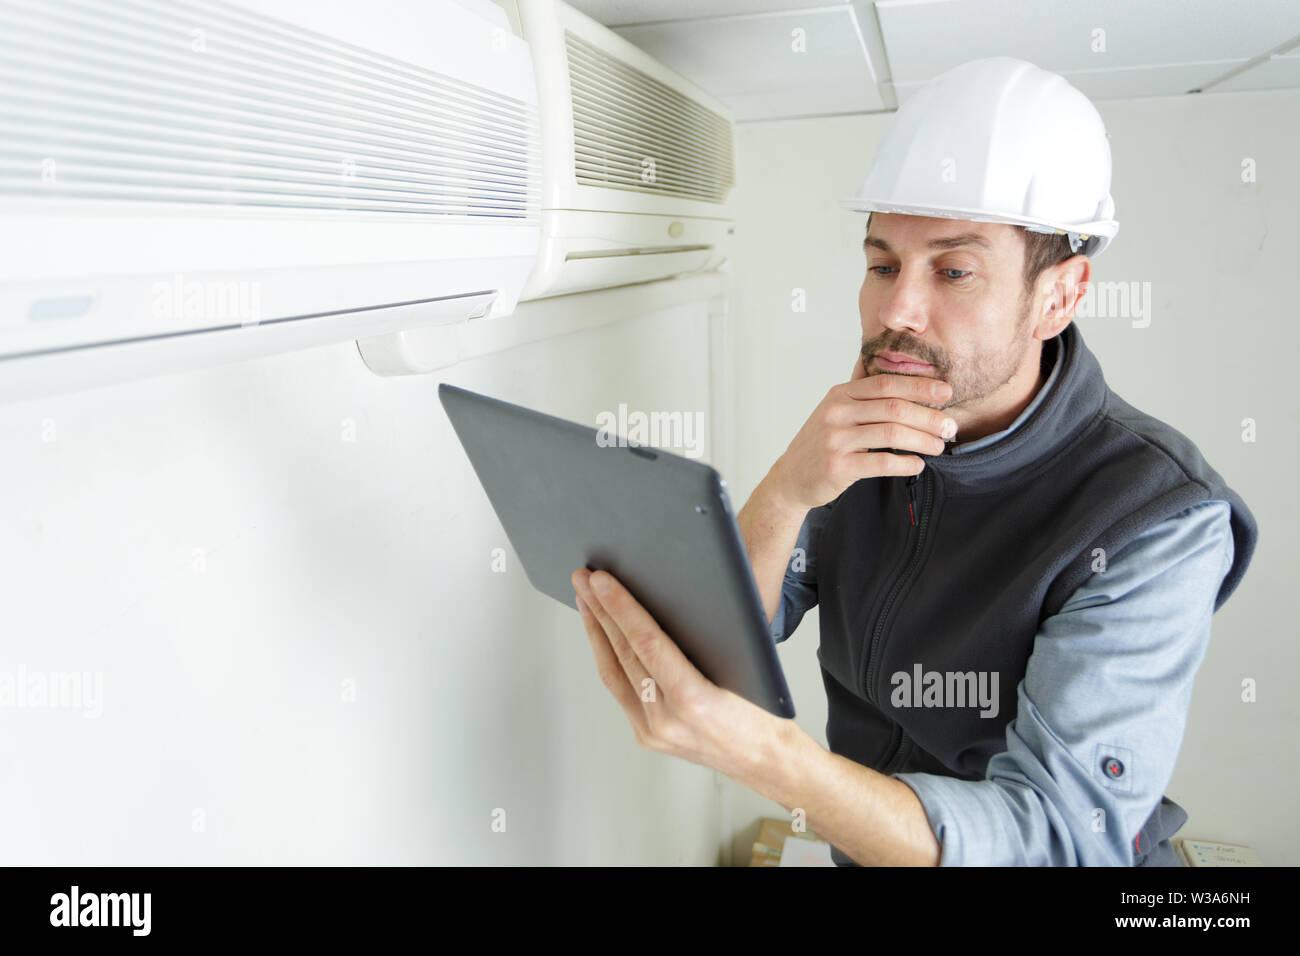 portrait of a maintenance technician - Stock Image